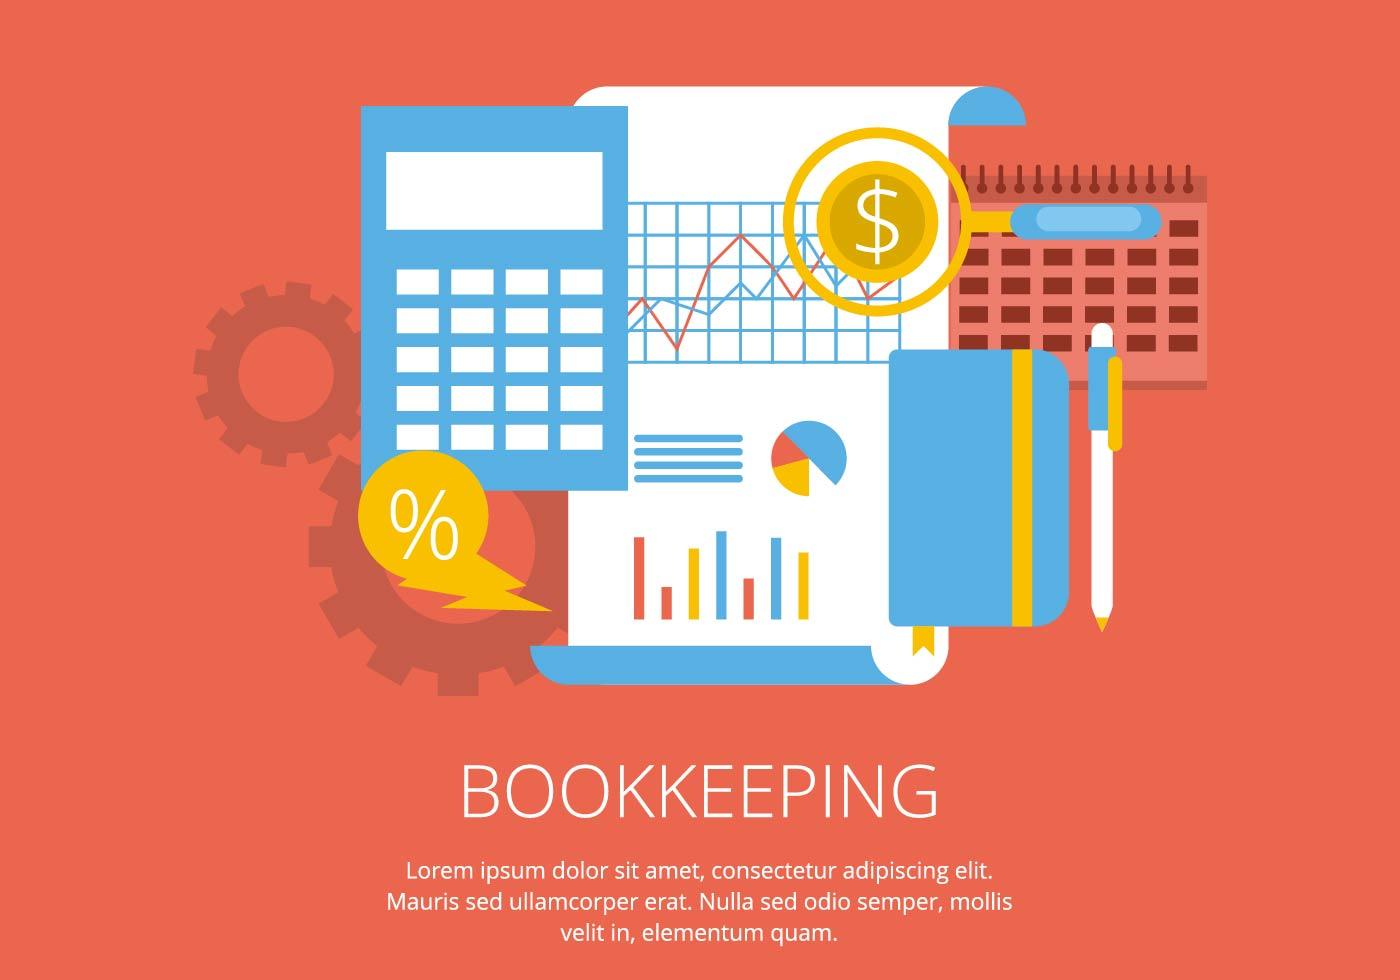 Bookkeeping Illustration Download Free Vector Art Stock